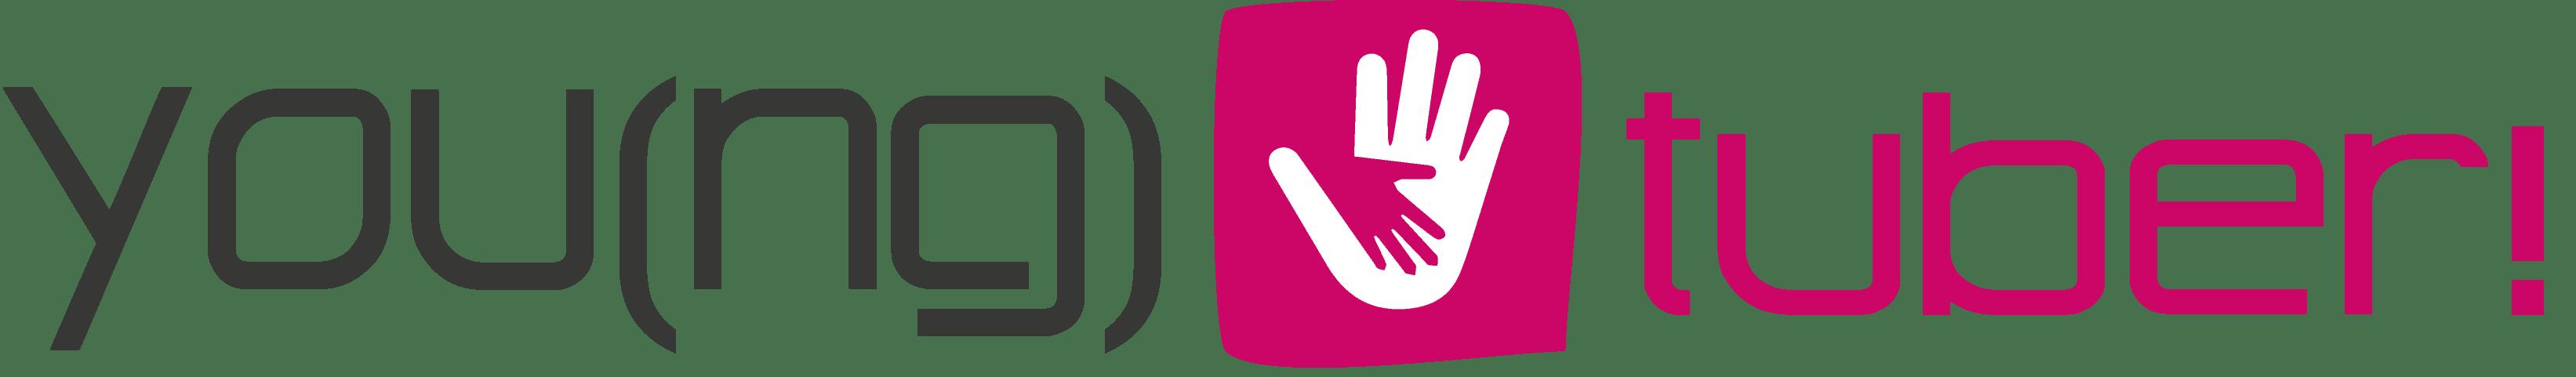 Probe!   You(ng)Tuber! - Ricerca qualitativa online genitore-bambino.